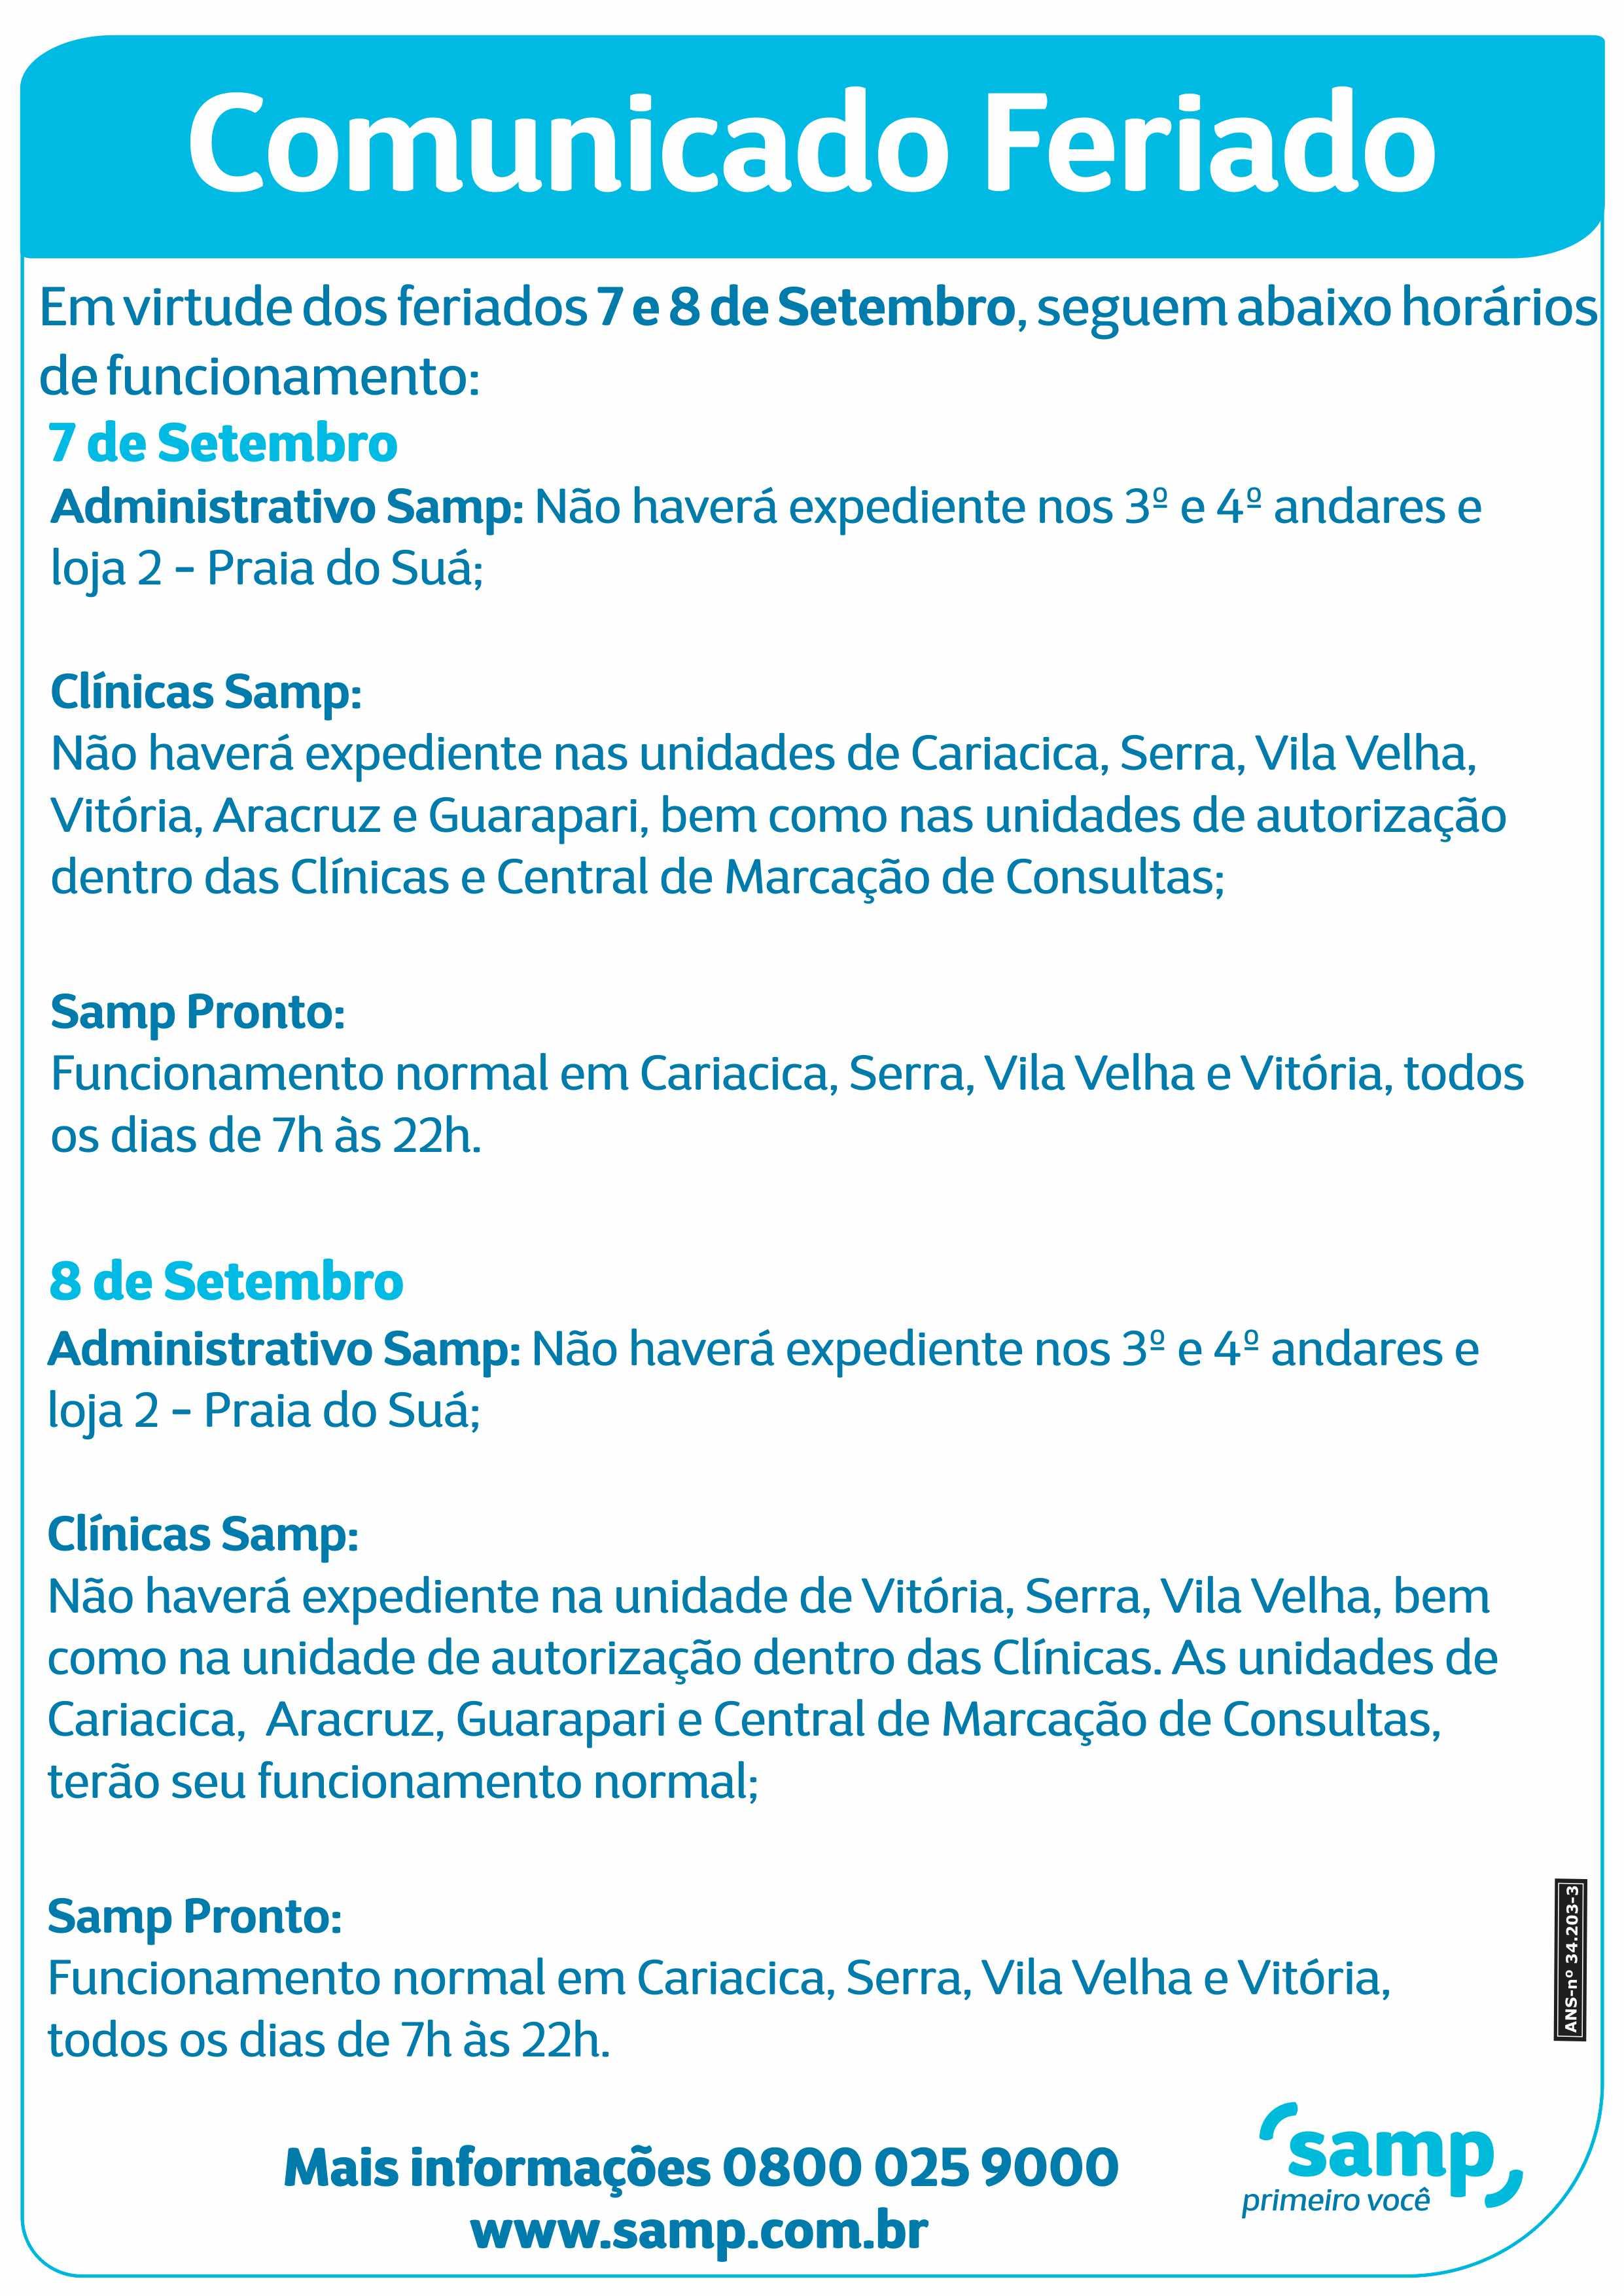 comunicados-gerais-7-e-8-de-setembro-2017-alterado4